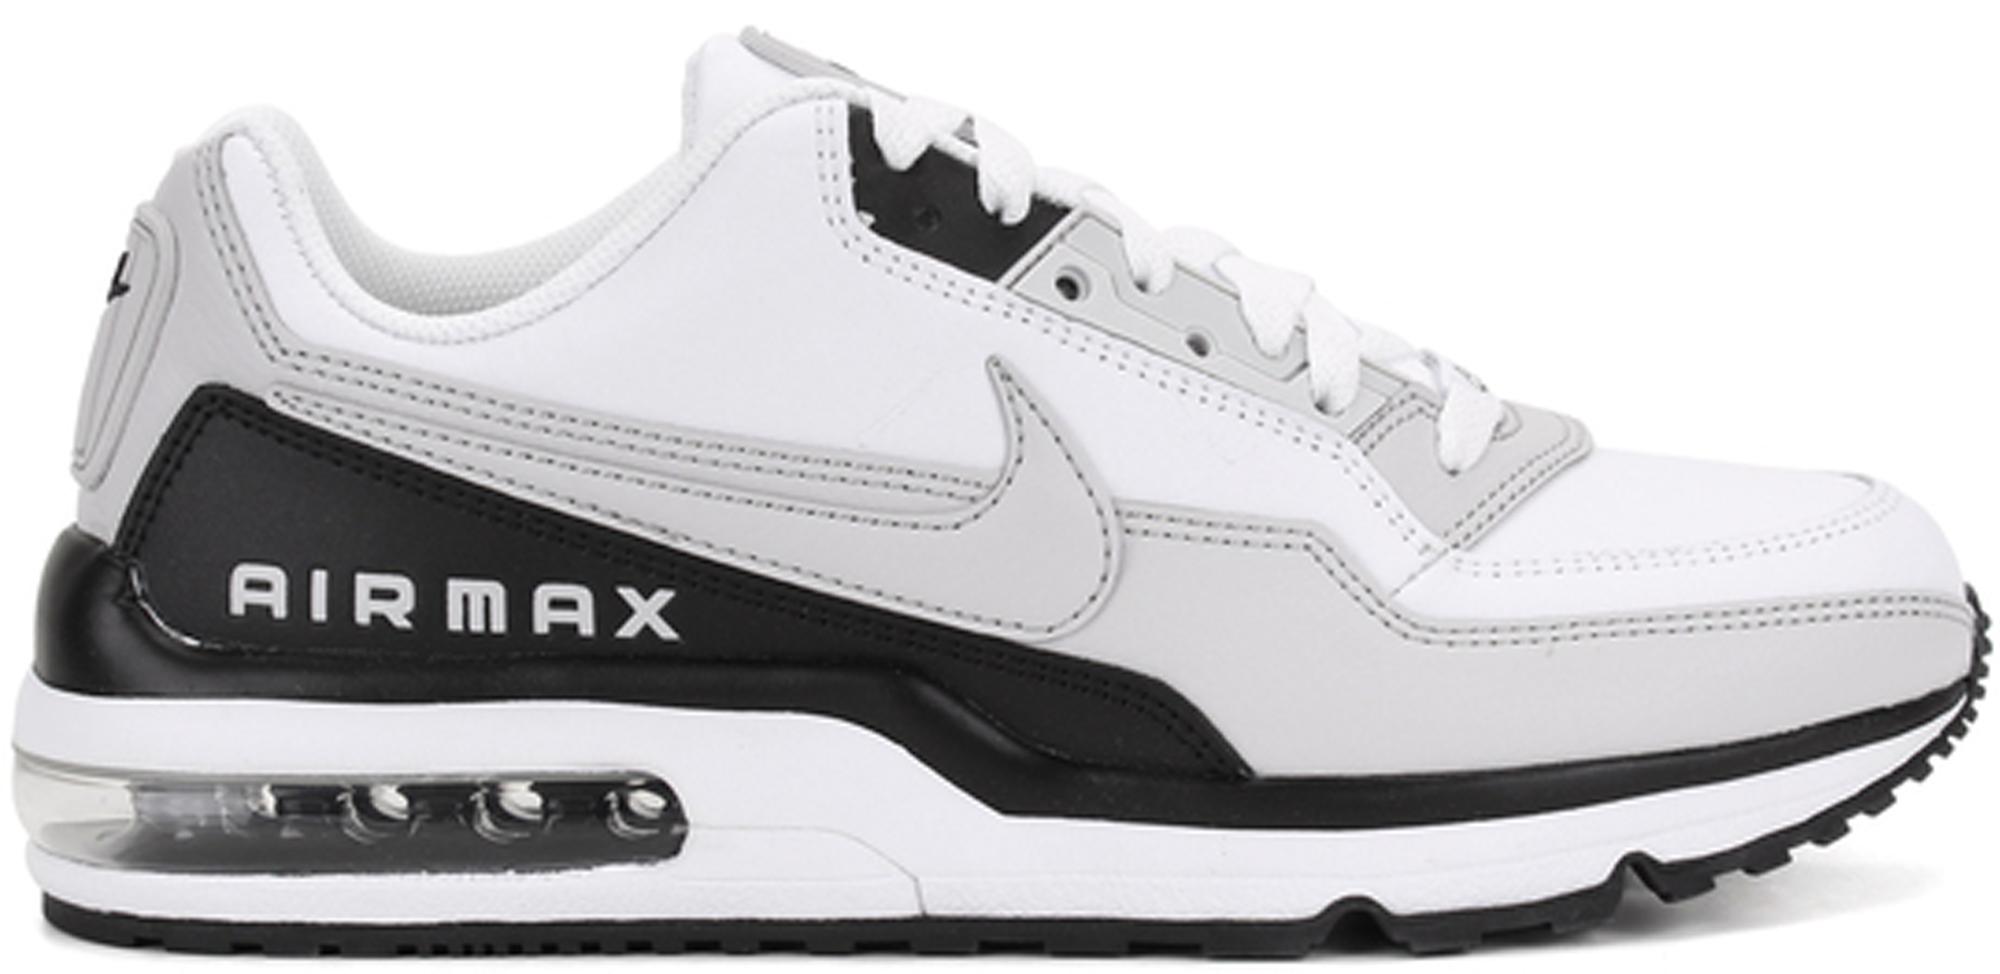 Nike Air Max LTD 3 White Grey Black